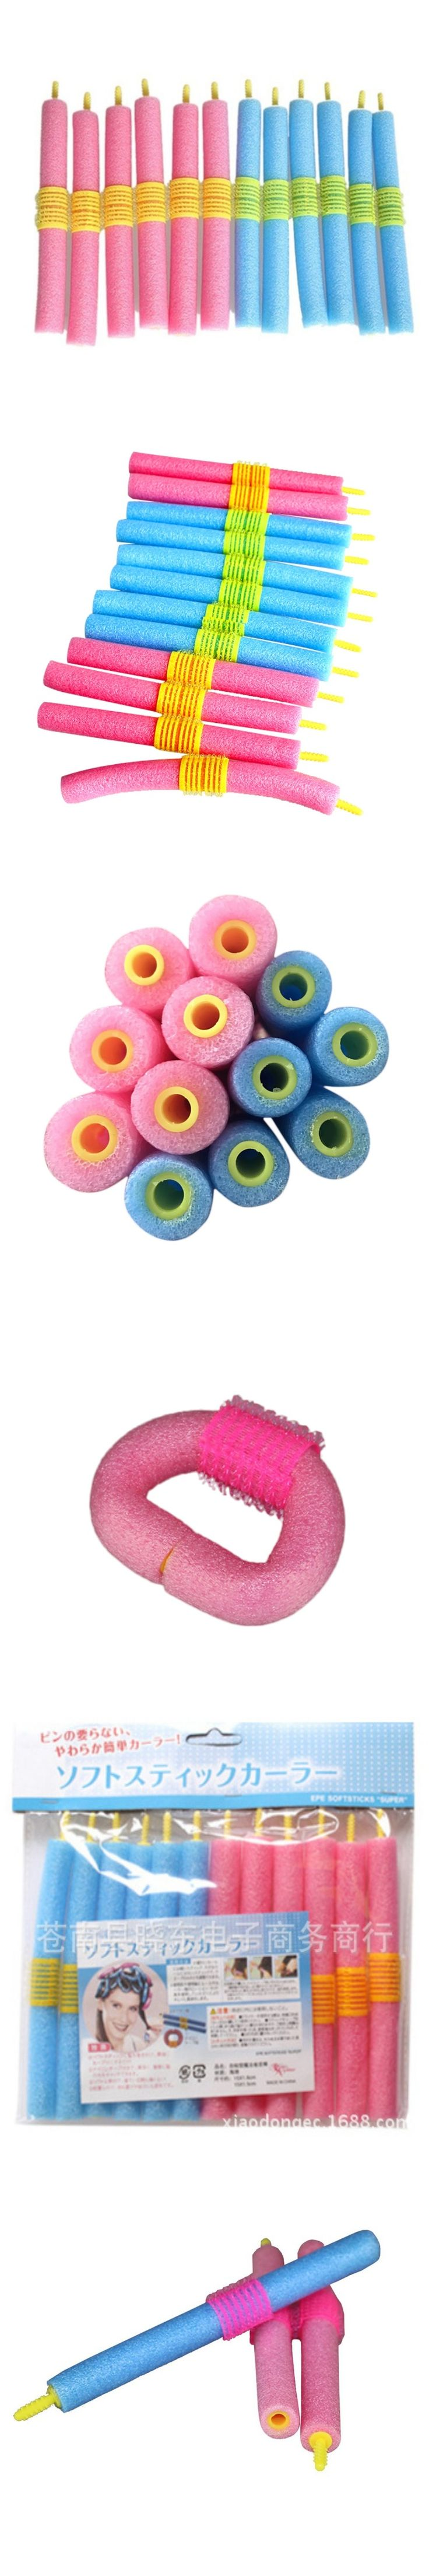 12pcs/lot New Foam Curler Magical Anion Hair Curler Soft Pearl Sponge Hair Care Styling Roll Stick Roller Curler